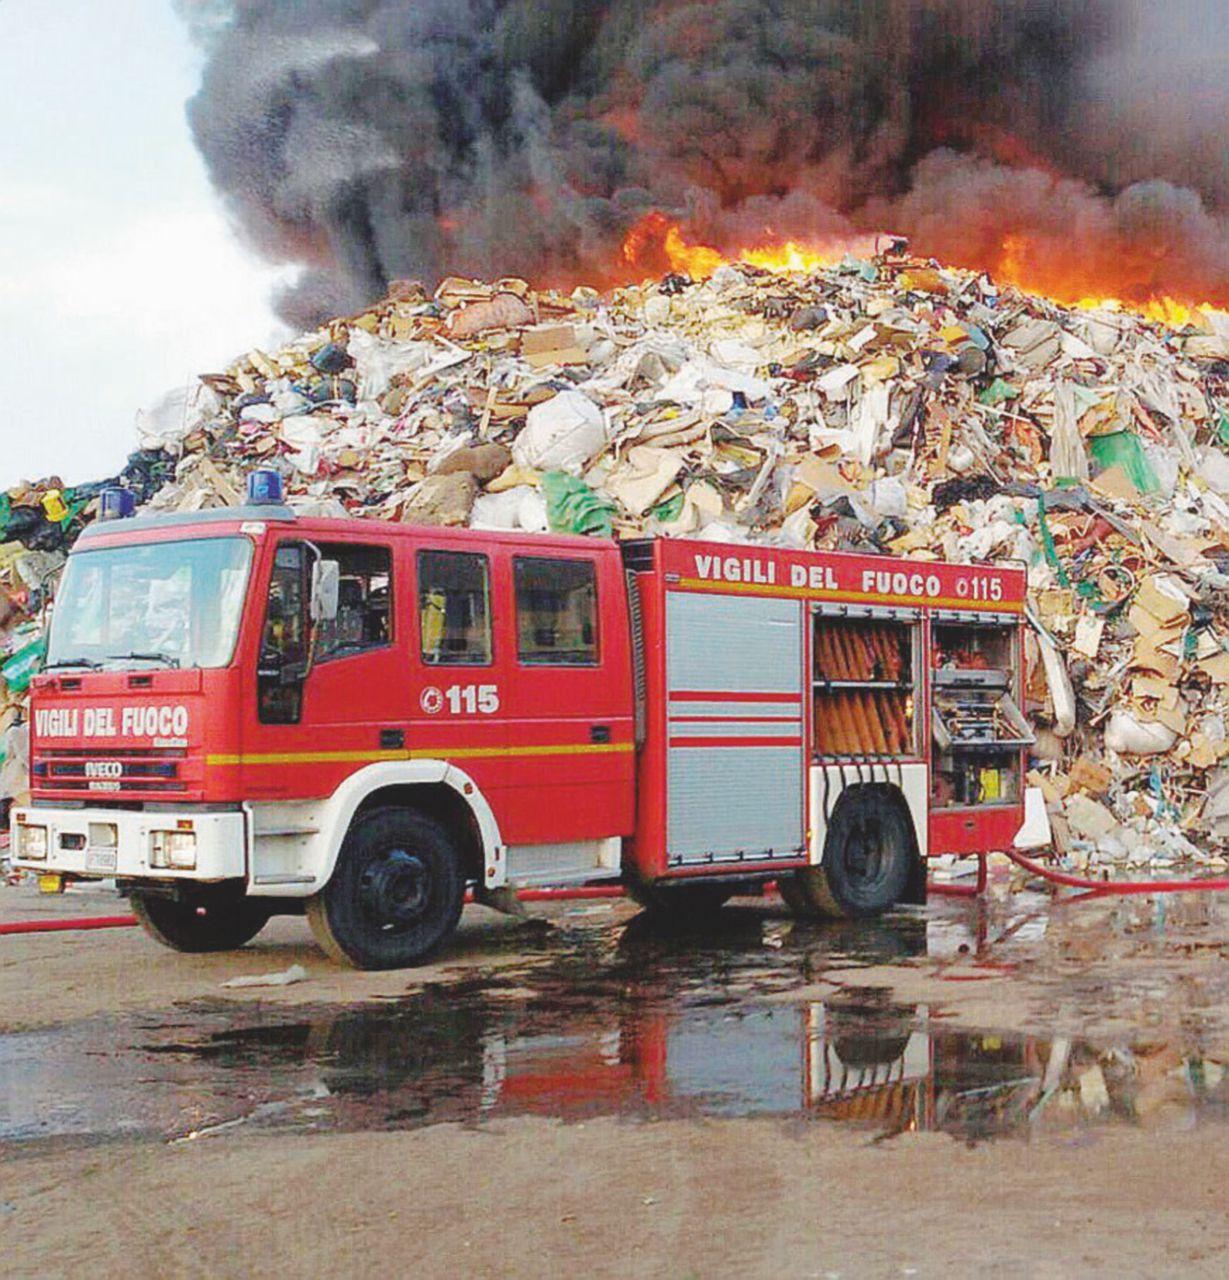 Rifiuti speciali in fiamme: allarme diossina a Mortara